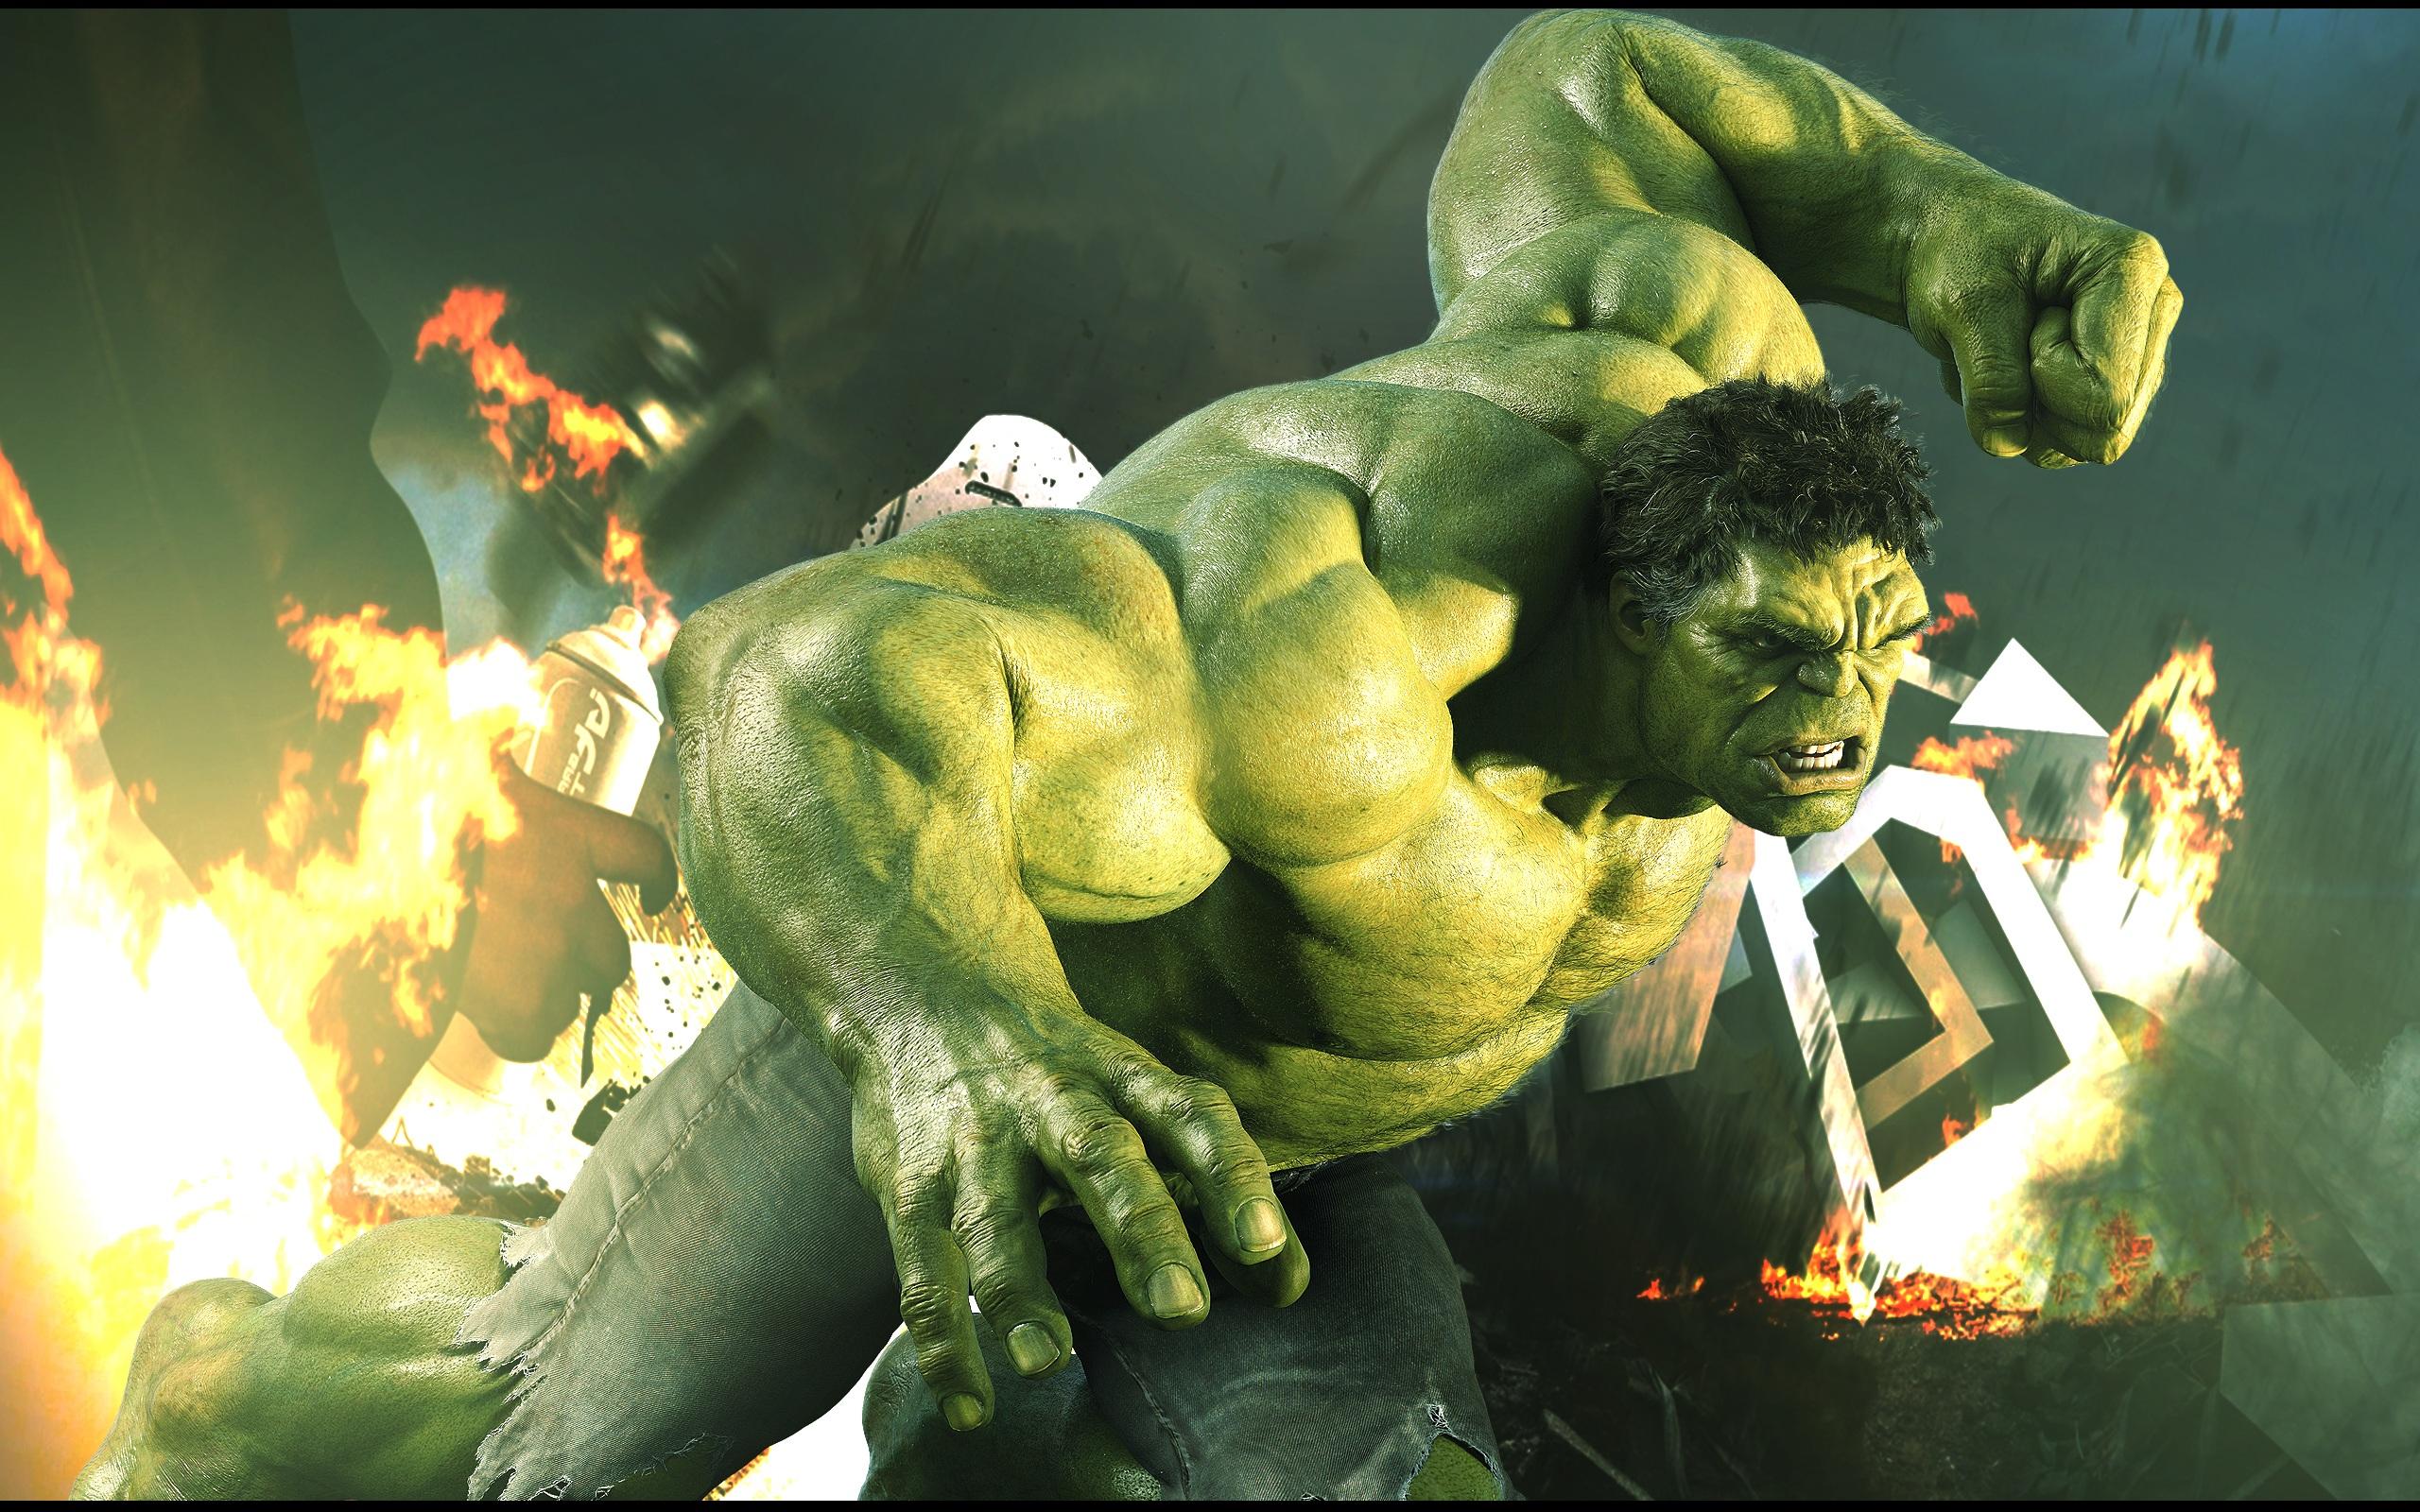 Hulk Wallpaper Hd Reverse by azzk1ka 2560x1600